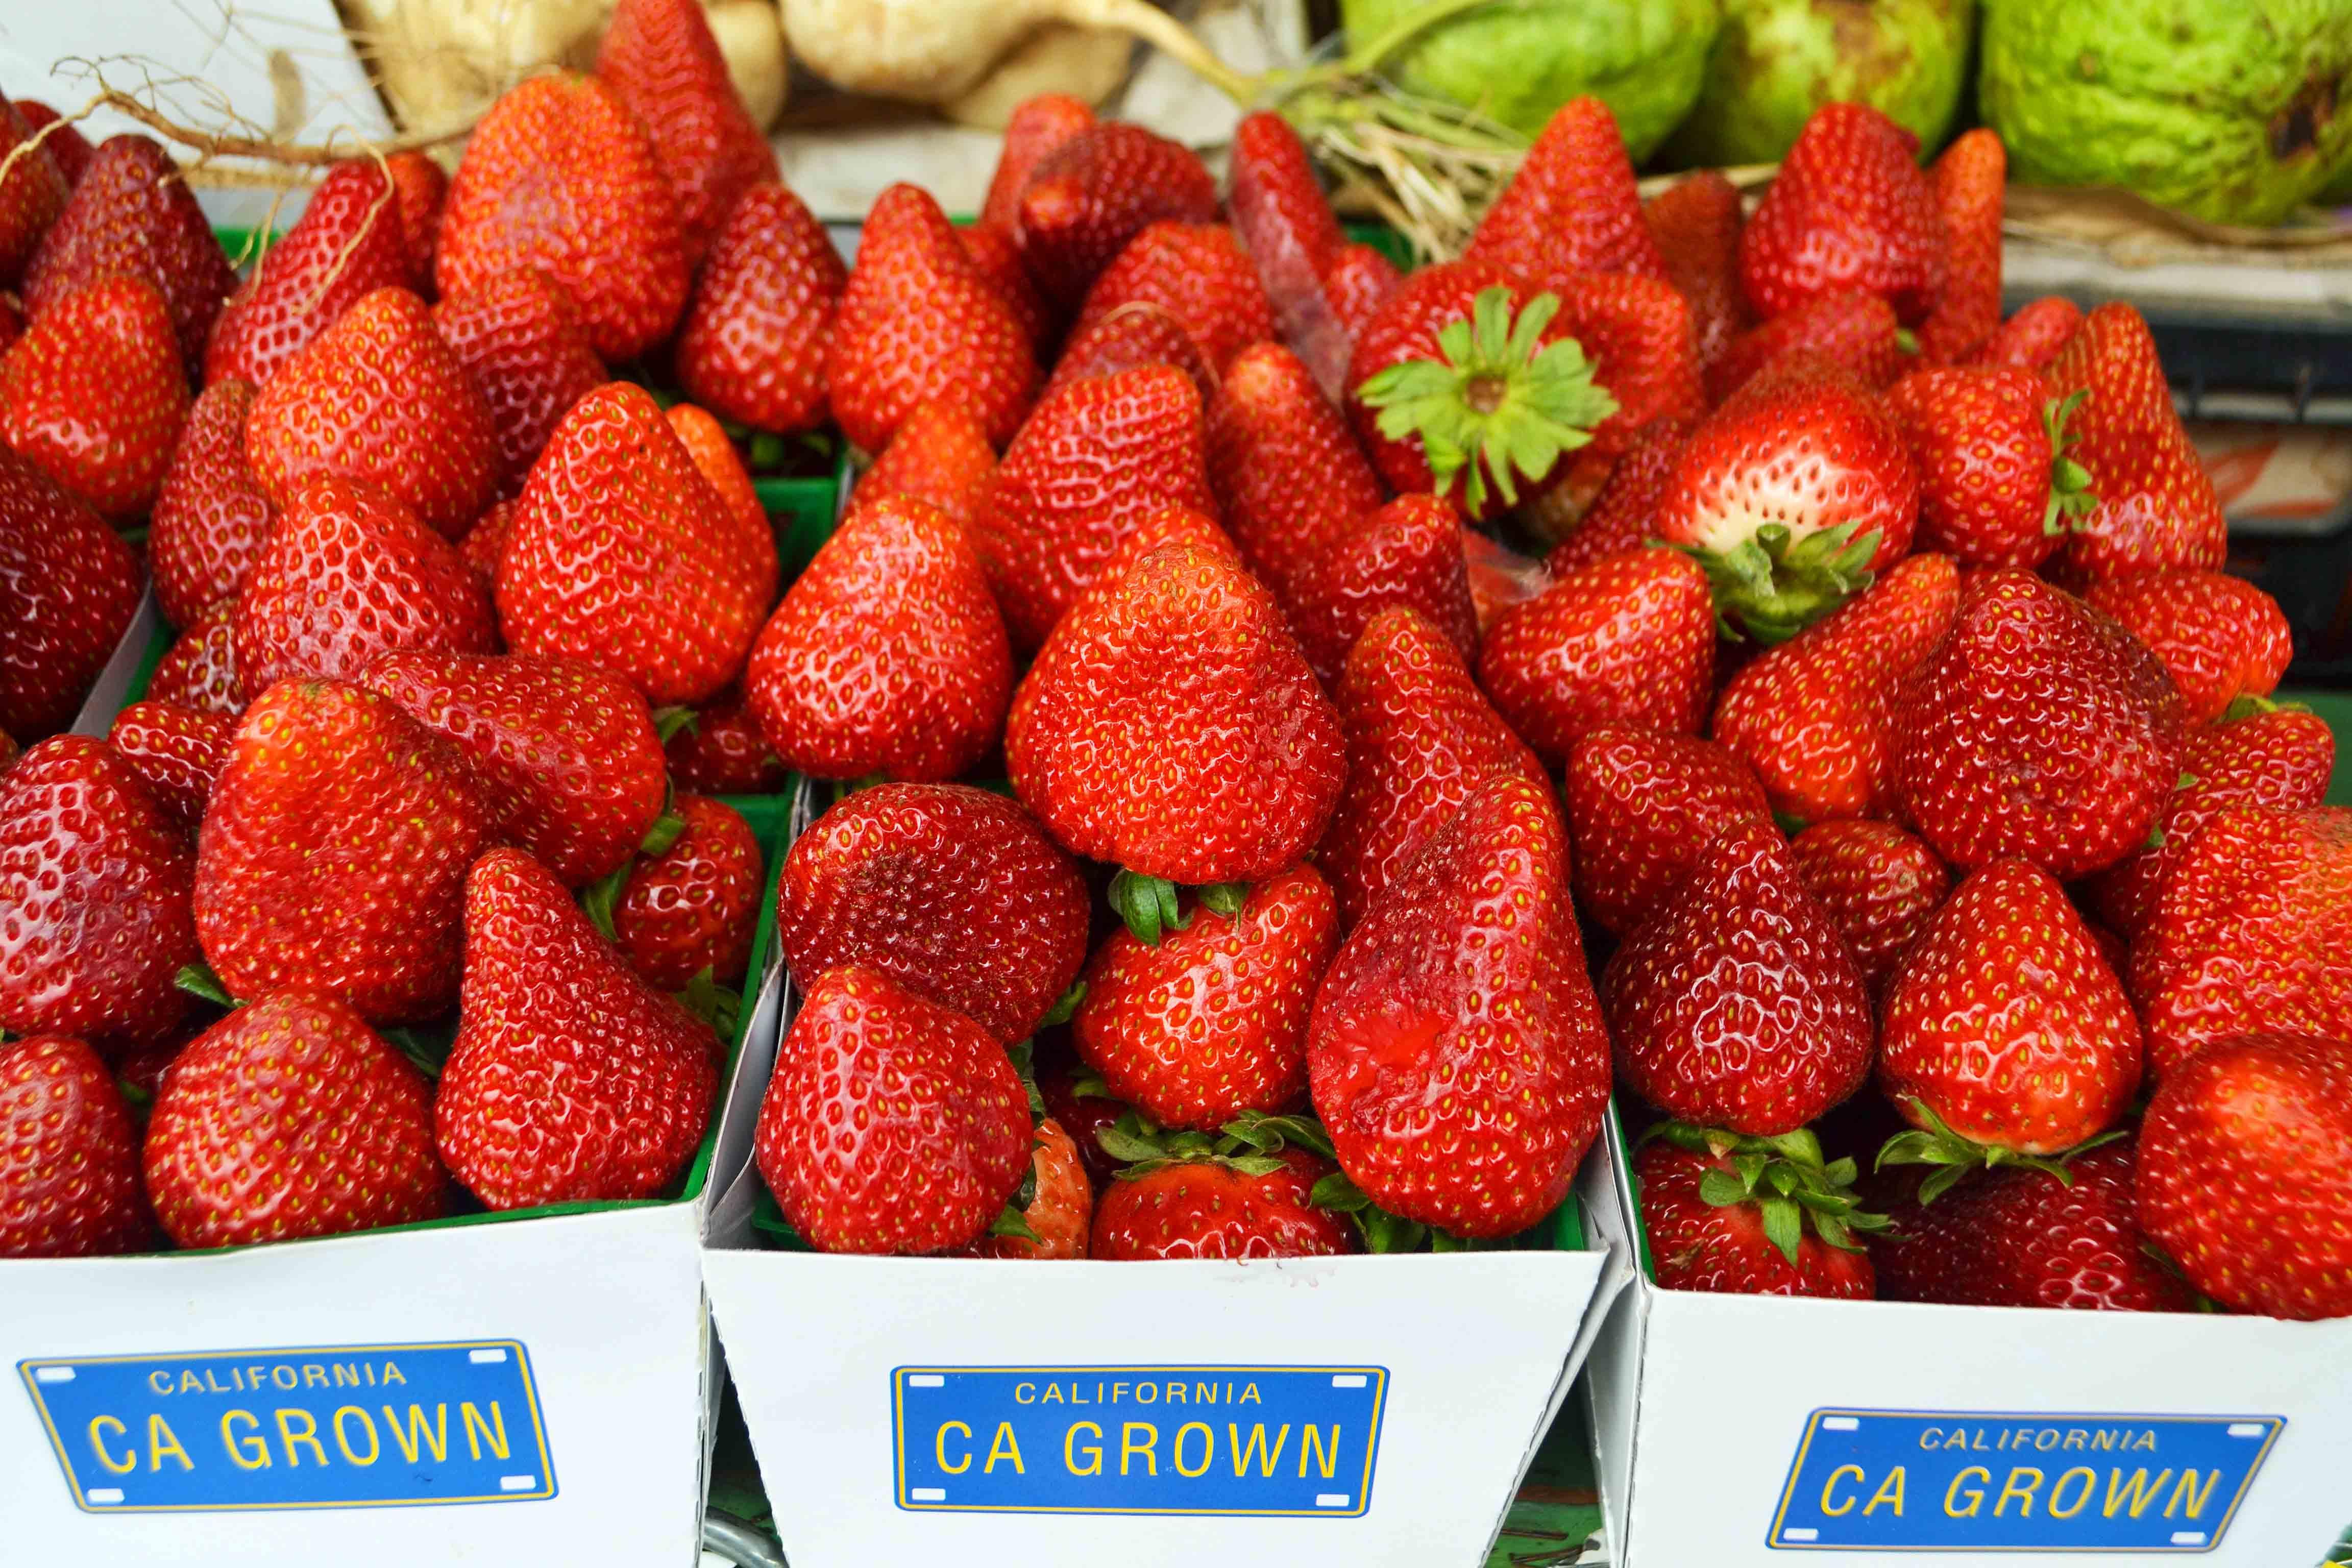 California Pacific Coast Highway 1 Road Trip Guide Farmer's Markets